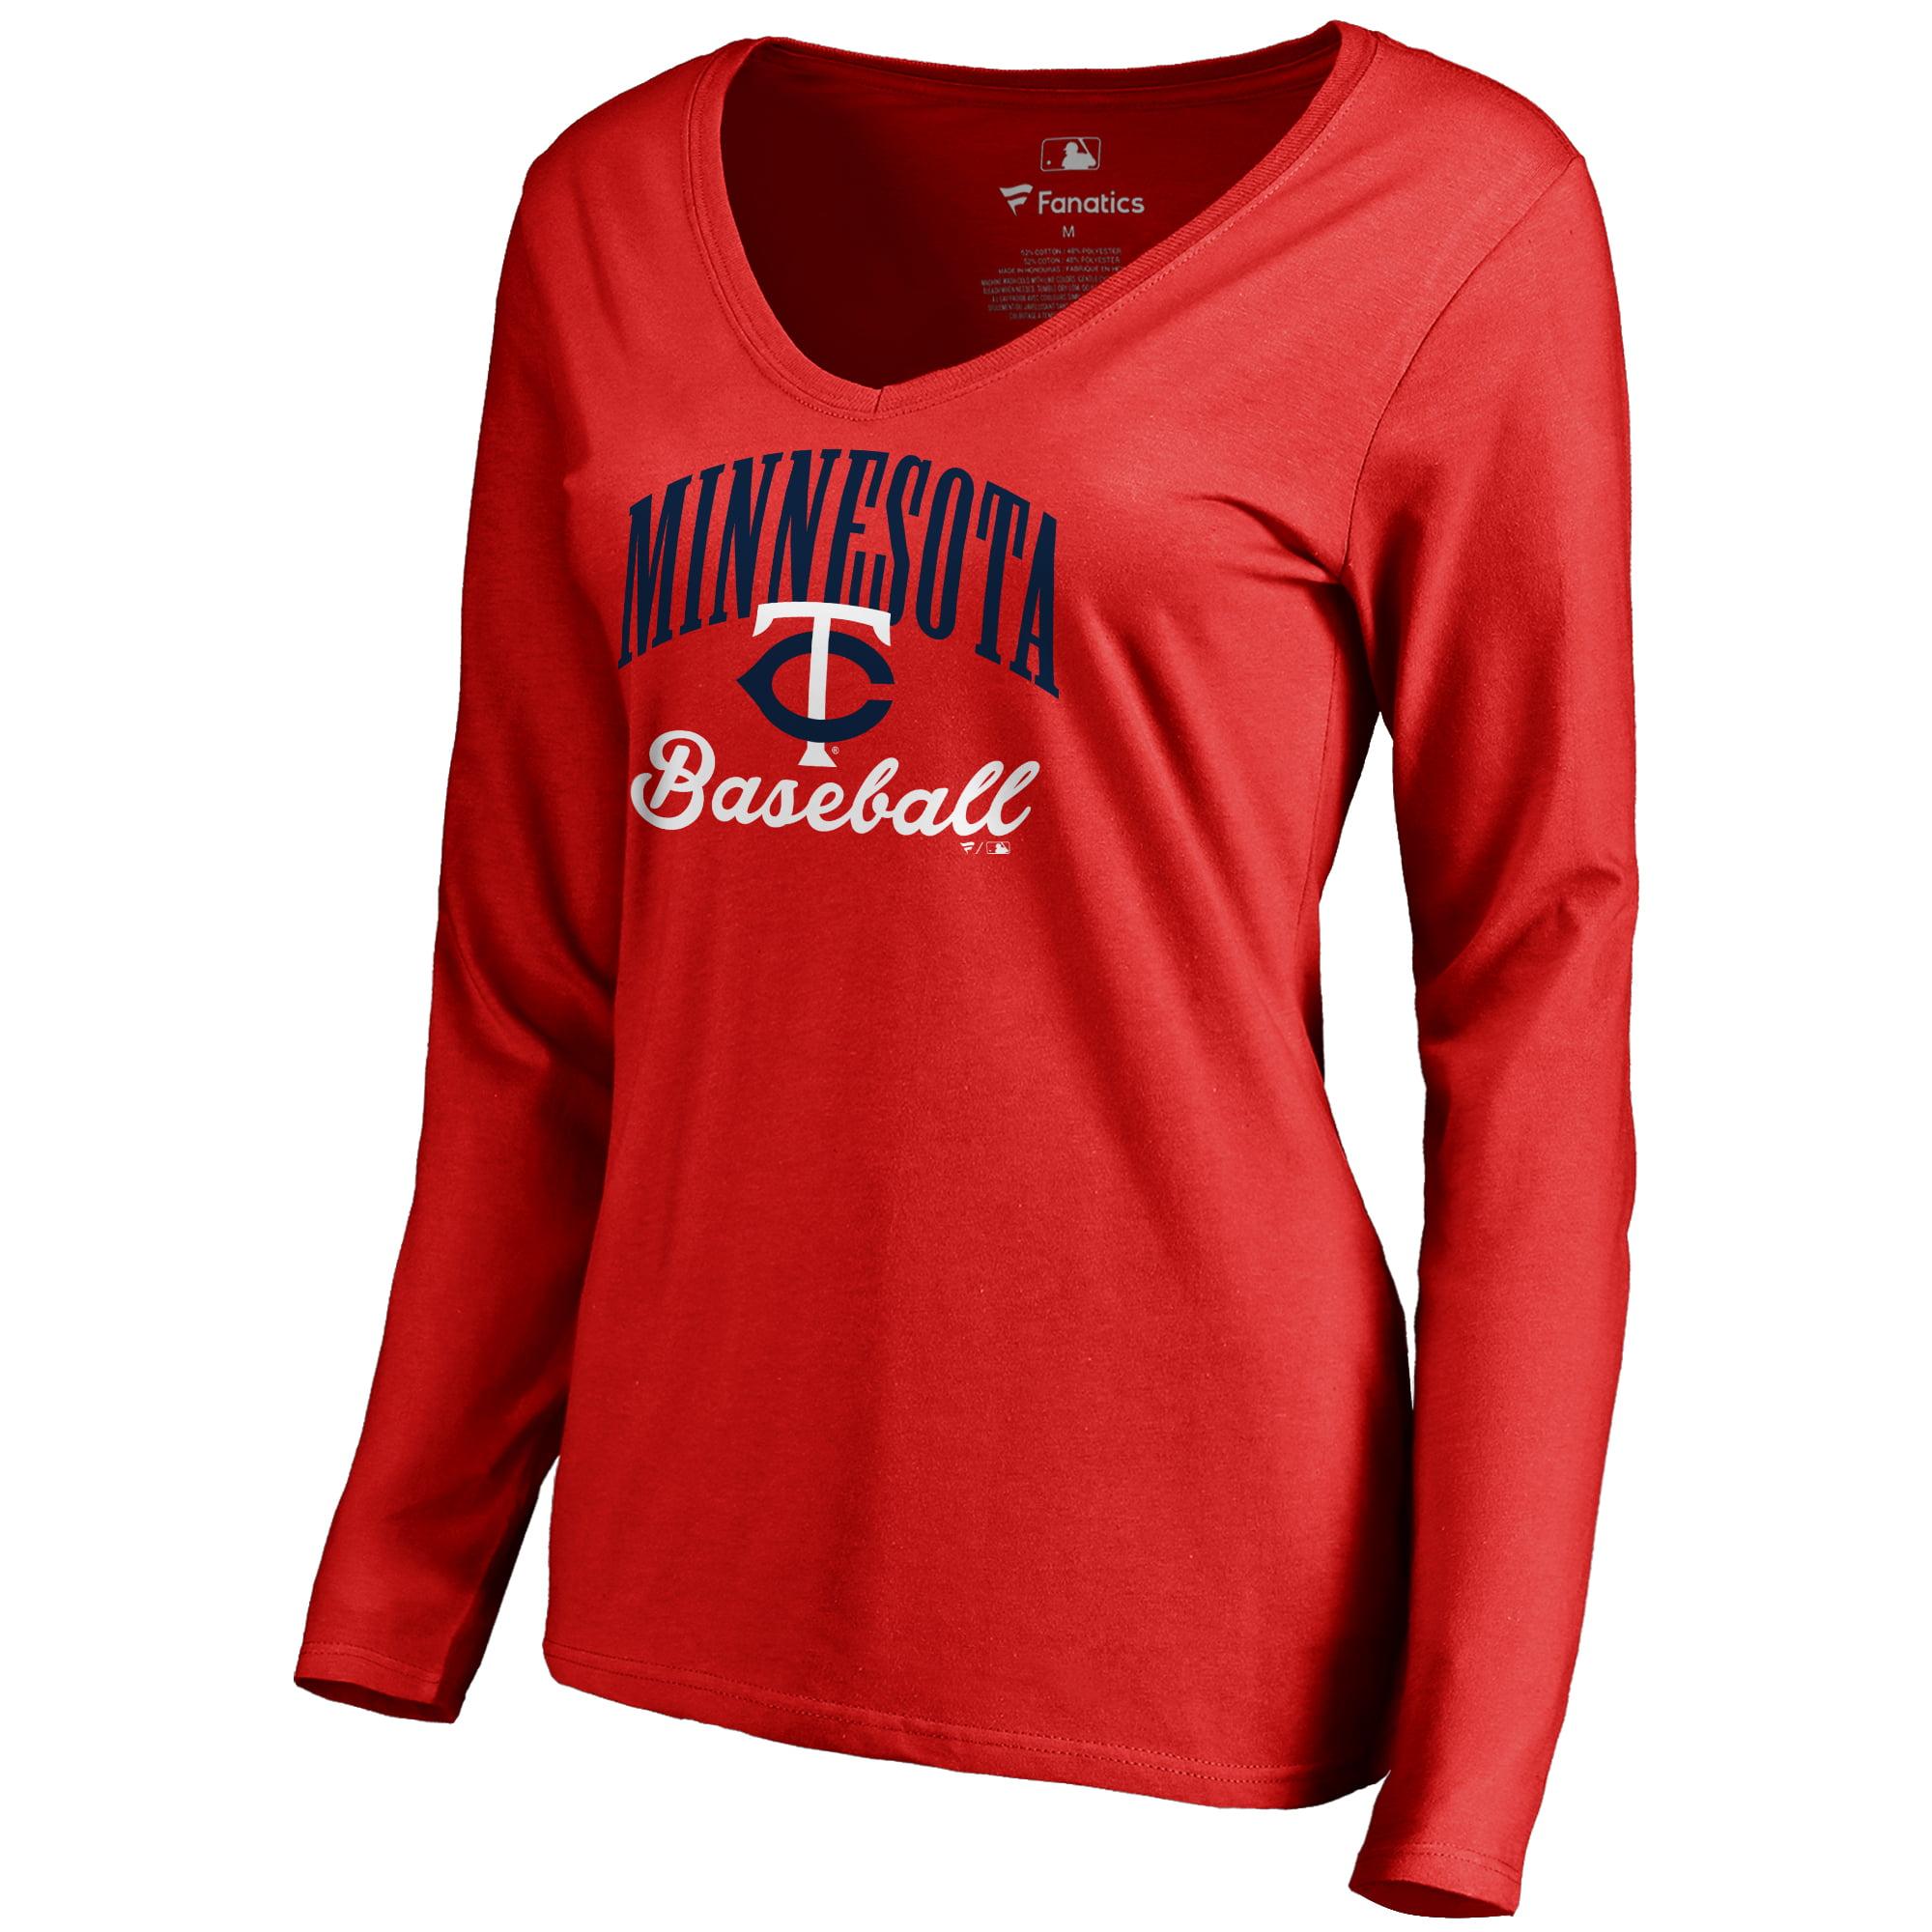 Minnesota Twins Women's Victory Script Long Sleeve T-Shirt - Red